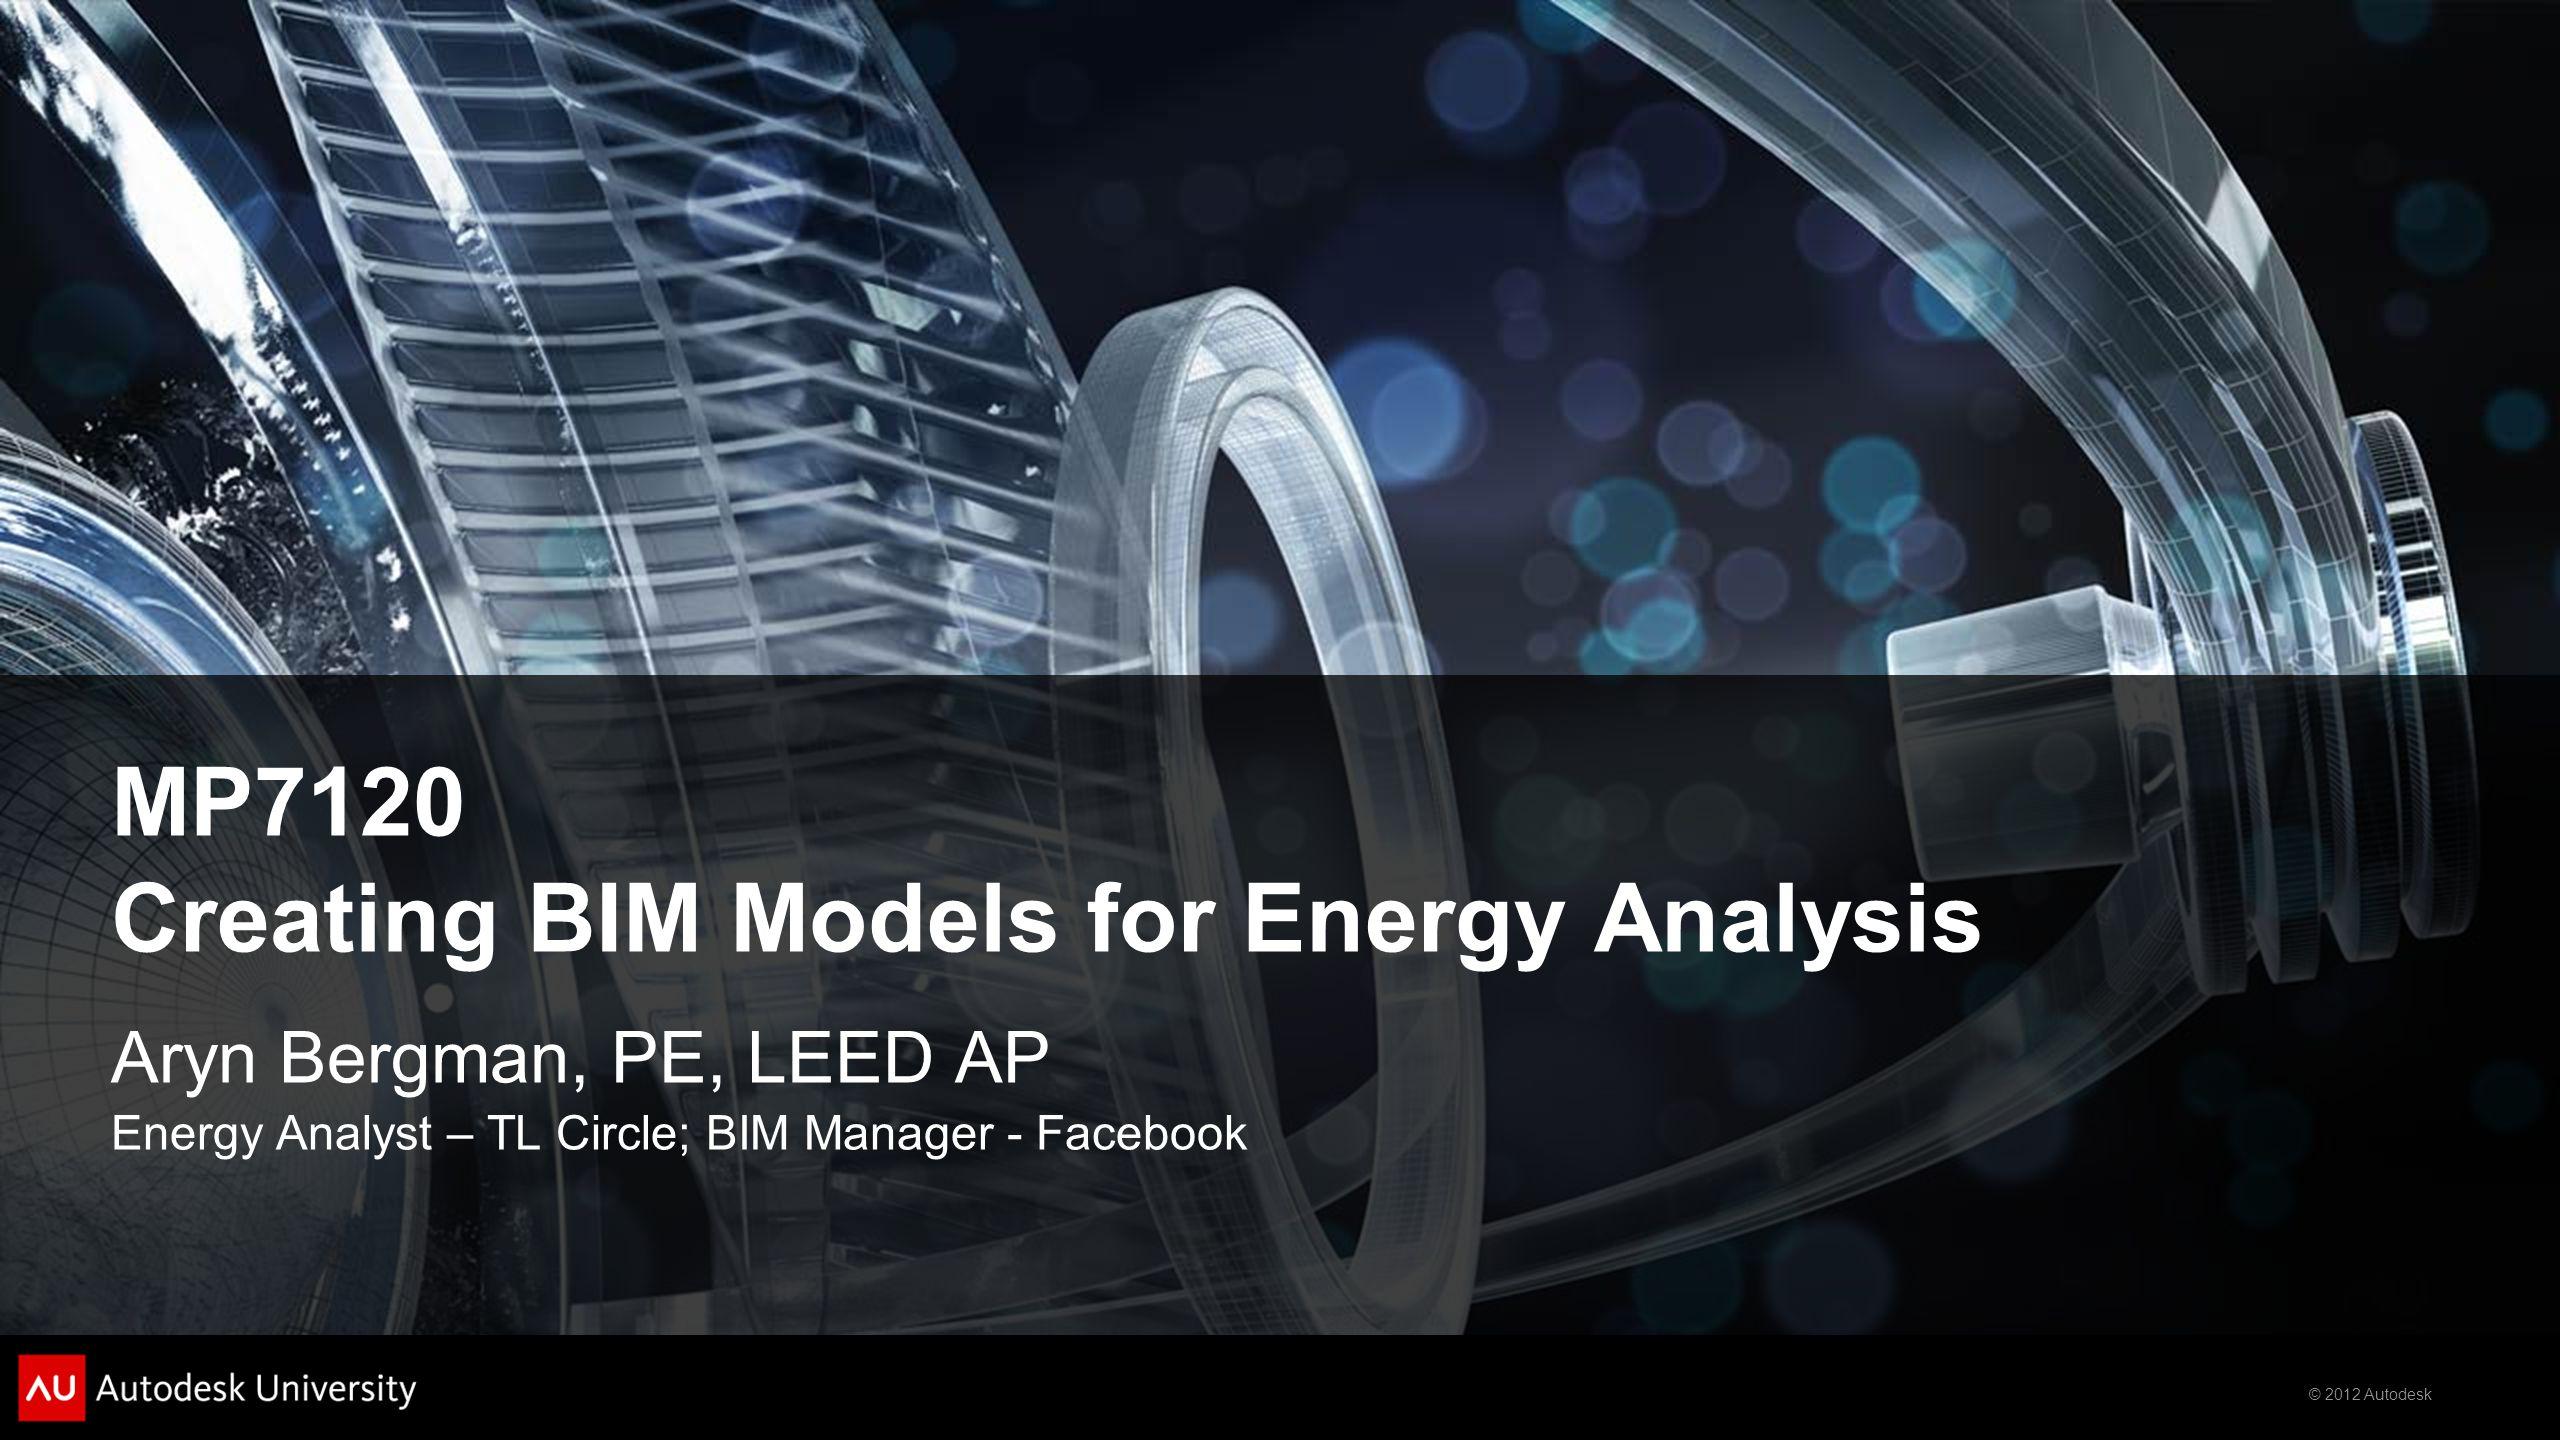 MP7120 Creating BIM Models for Energy Analysis